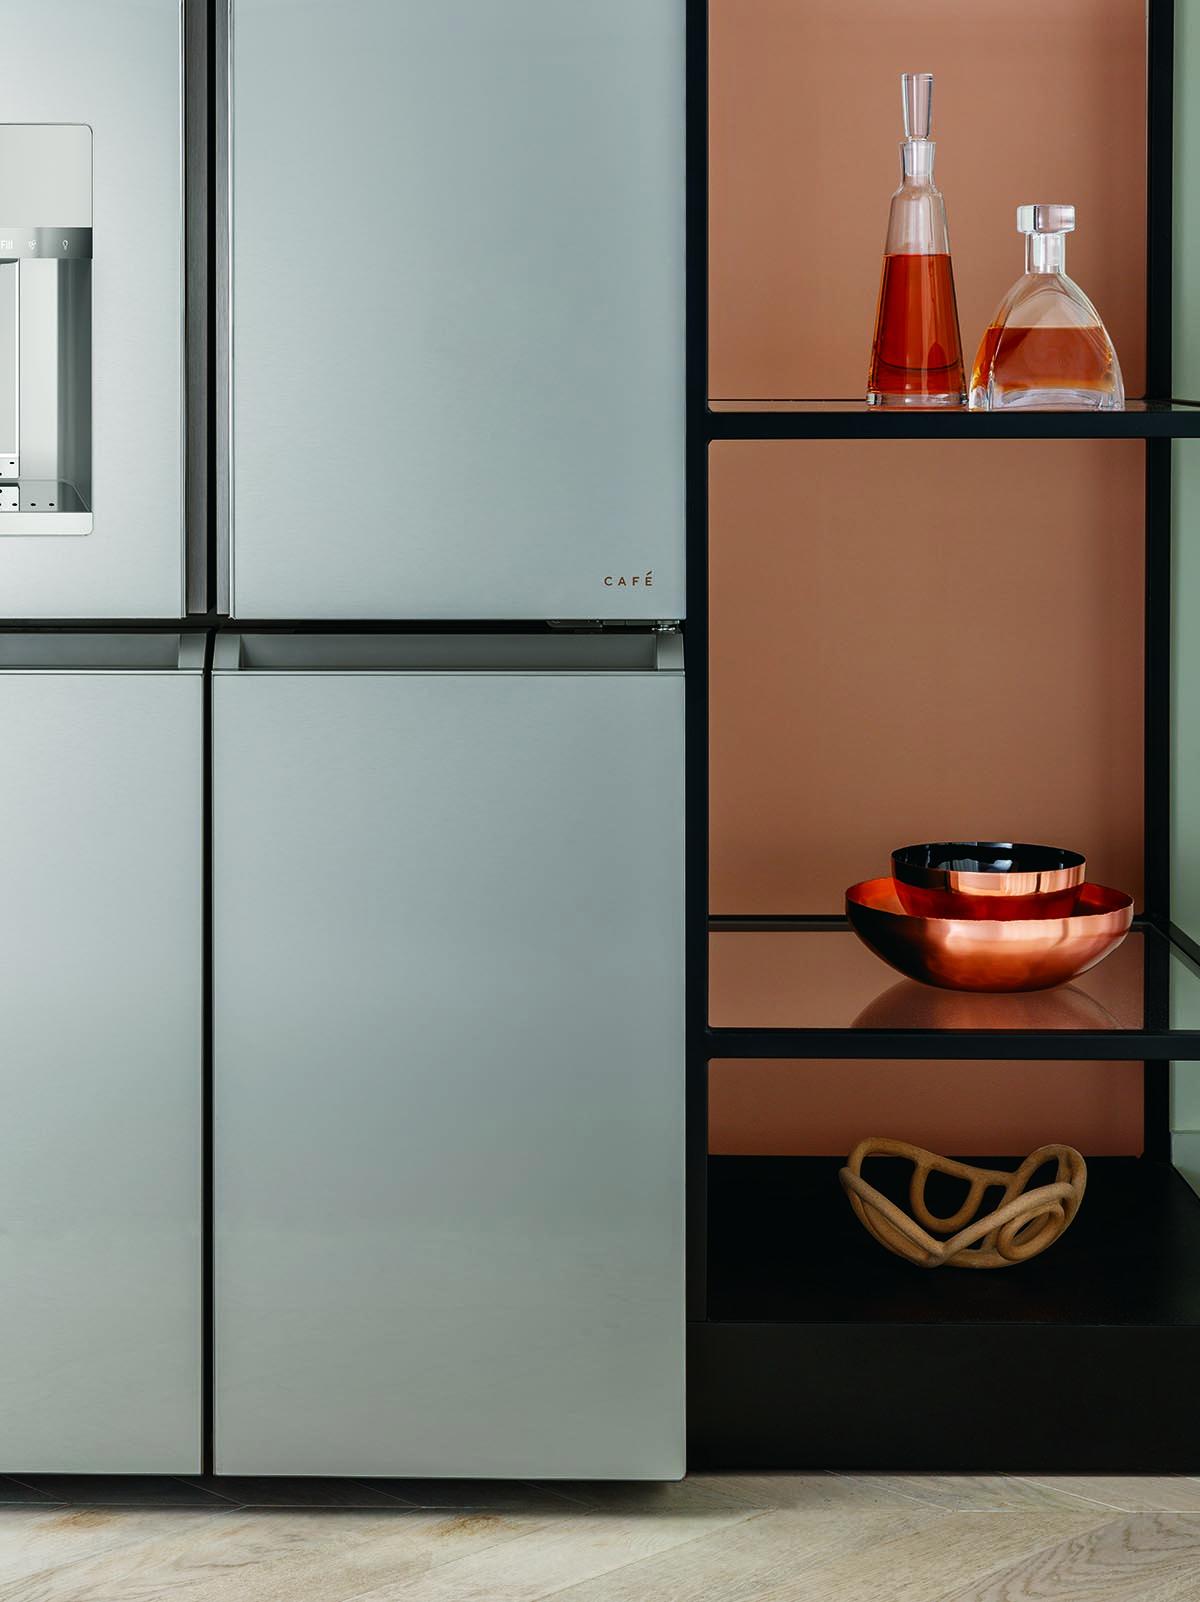 Cafe Quad-Door Refrigerator